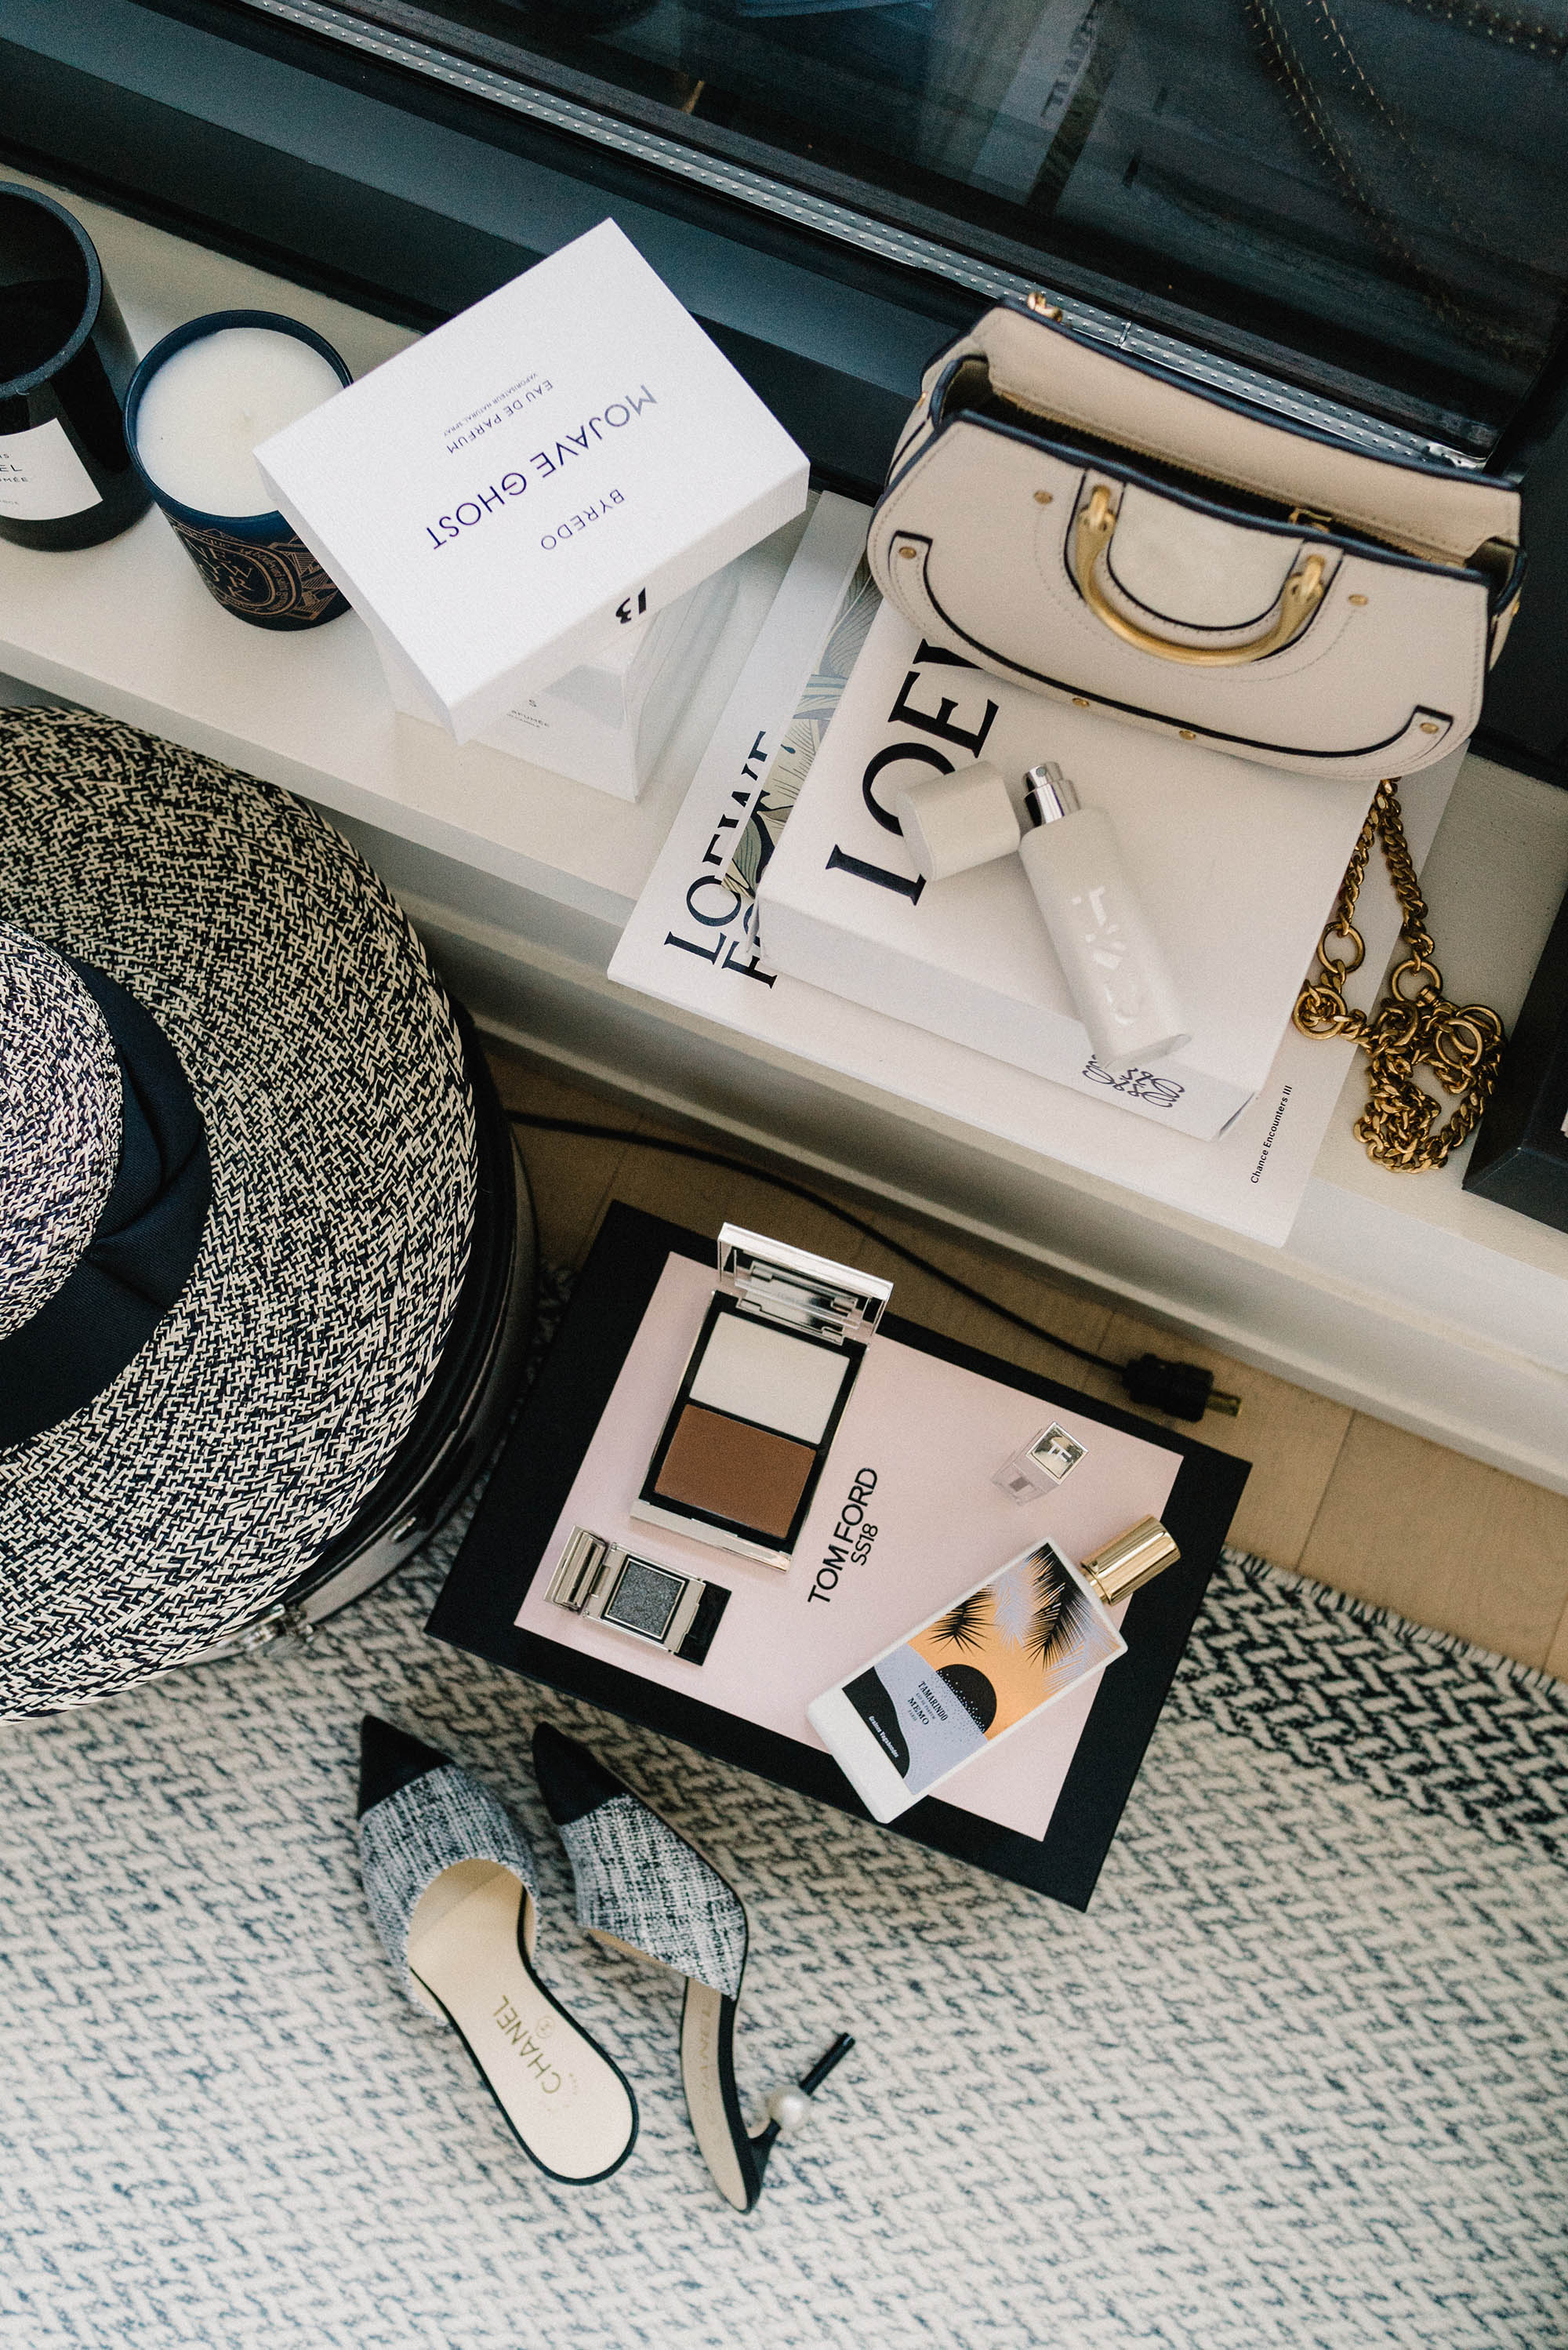 Chloe Bag ,  Byredo Fragrance Travel Case ,  Tom Ford Beauty ,  MEMO Paris Fragrance , Chanel Mules